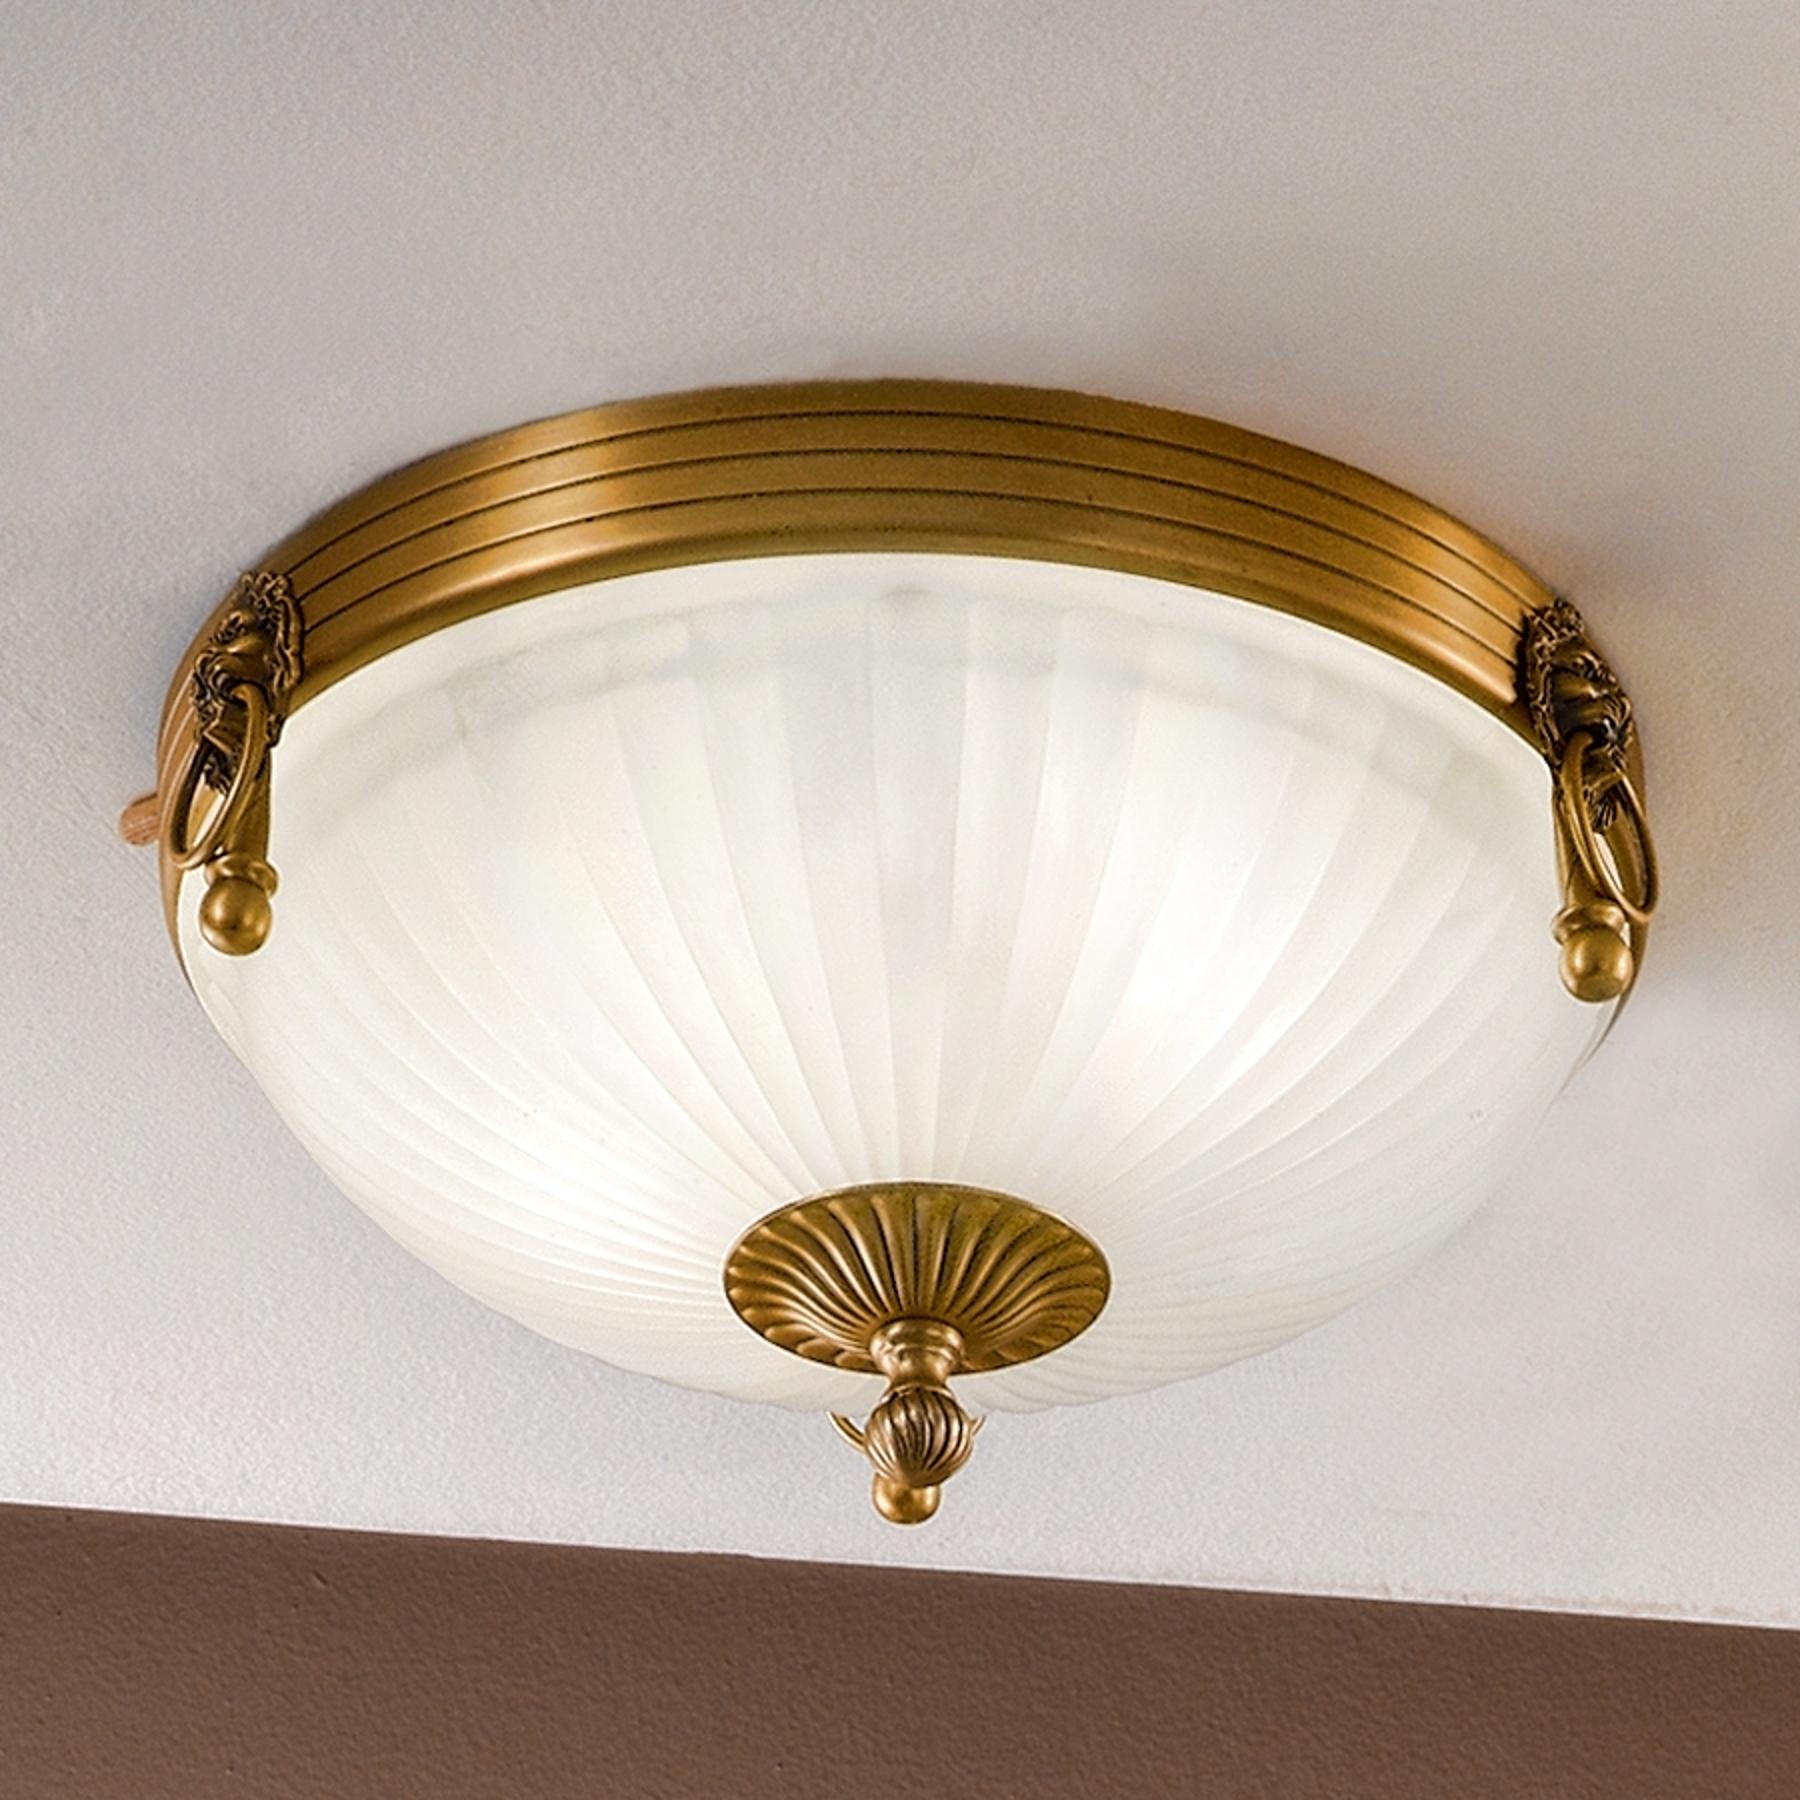 Fabelachtige plafondlamp NOAM - 31cm